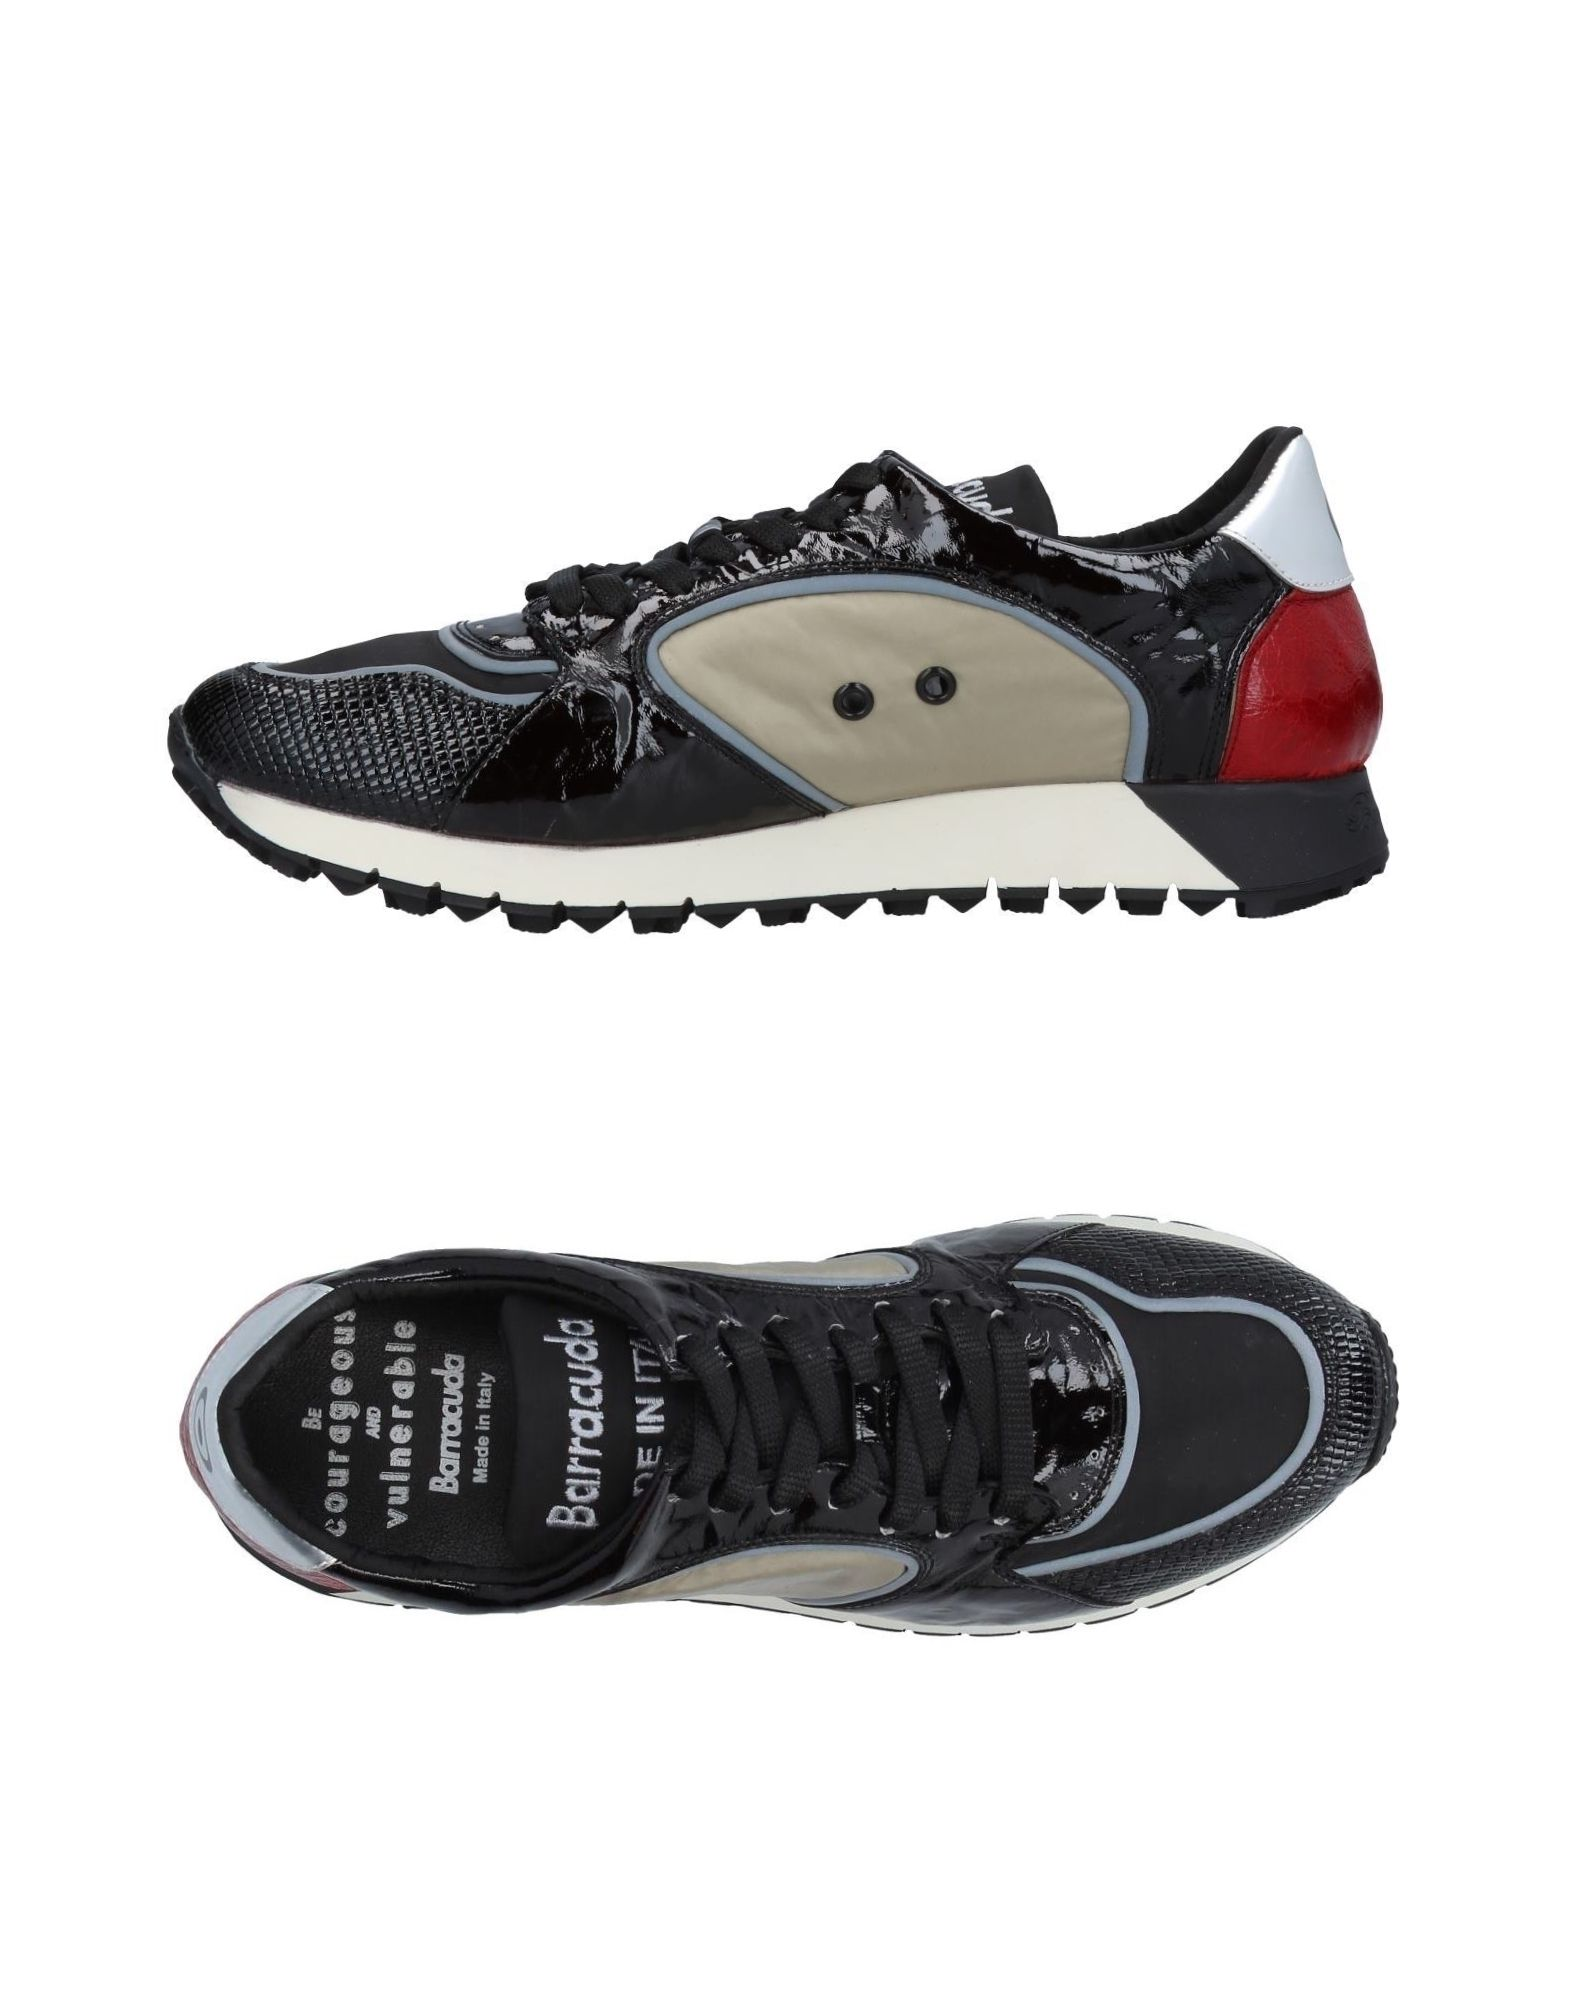 Moda Sneakers Sneakers Moda Barracuda Uomo - 11415396IJ 7f4138